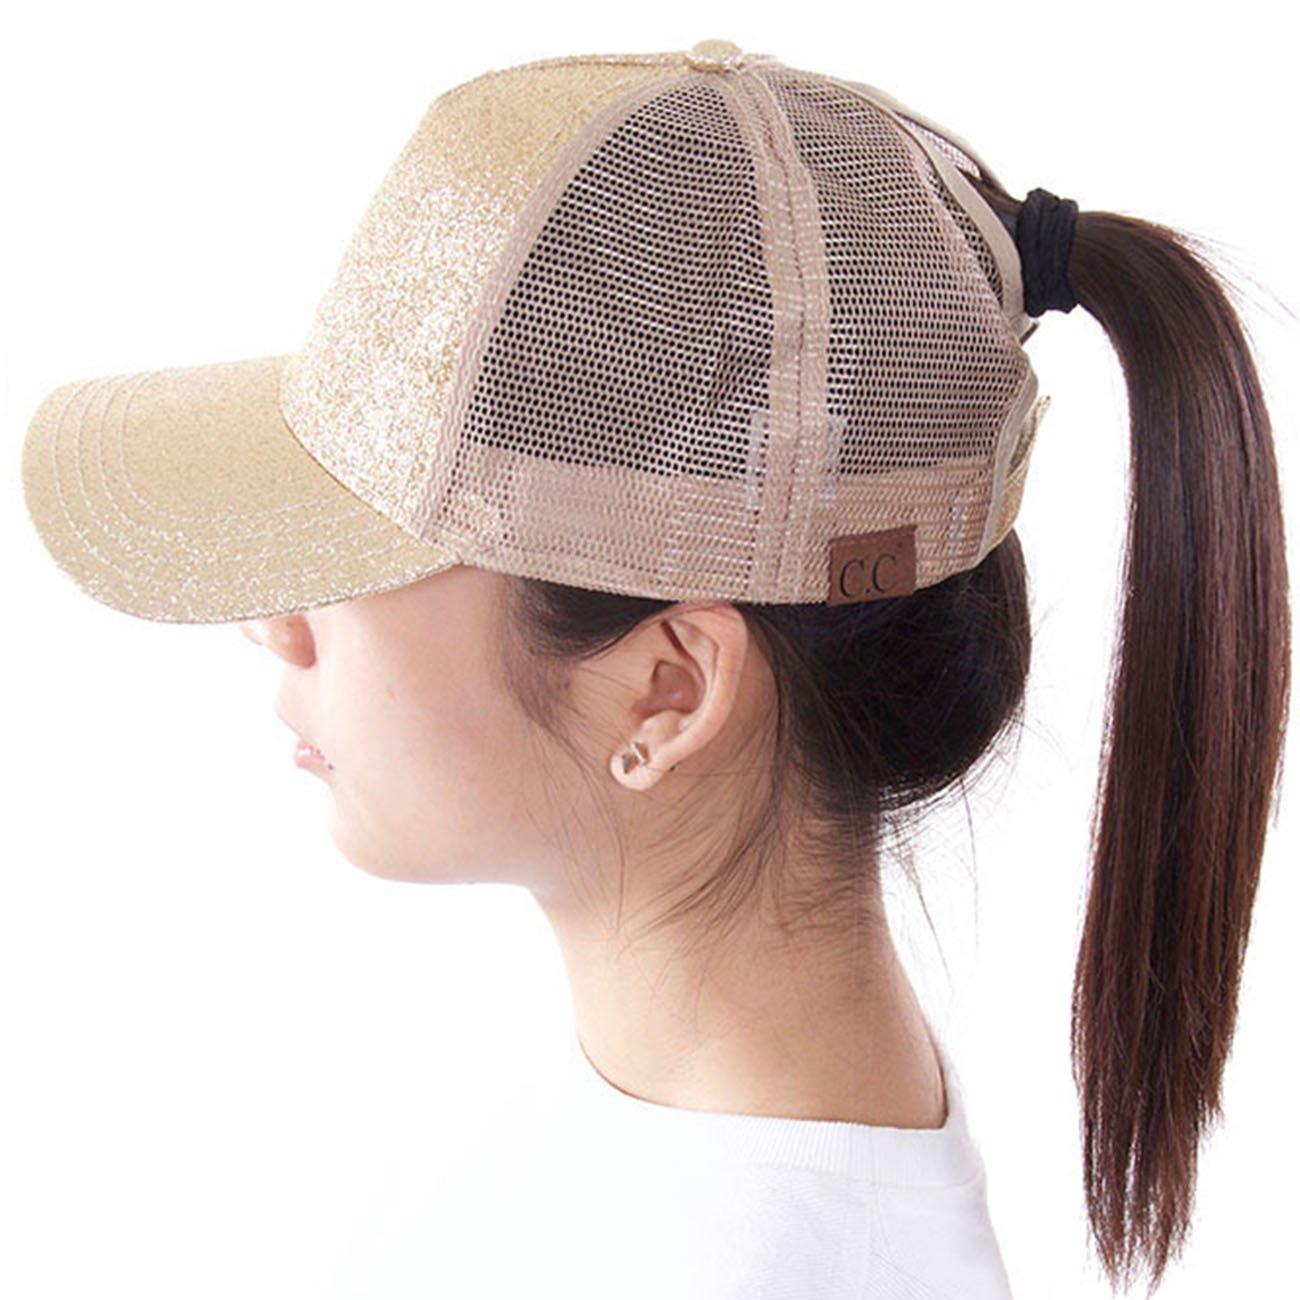 ScarvesMe C.C Ponytail Cap Messy Buns Trucker Plain Baseball Ponycap Hat (Glitter Gold)